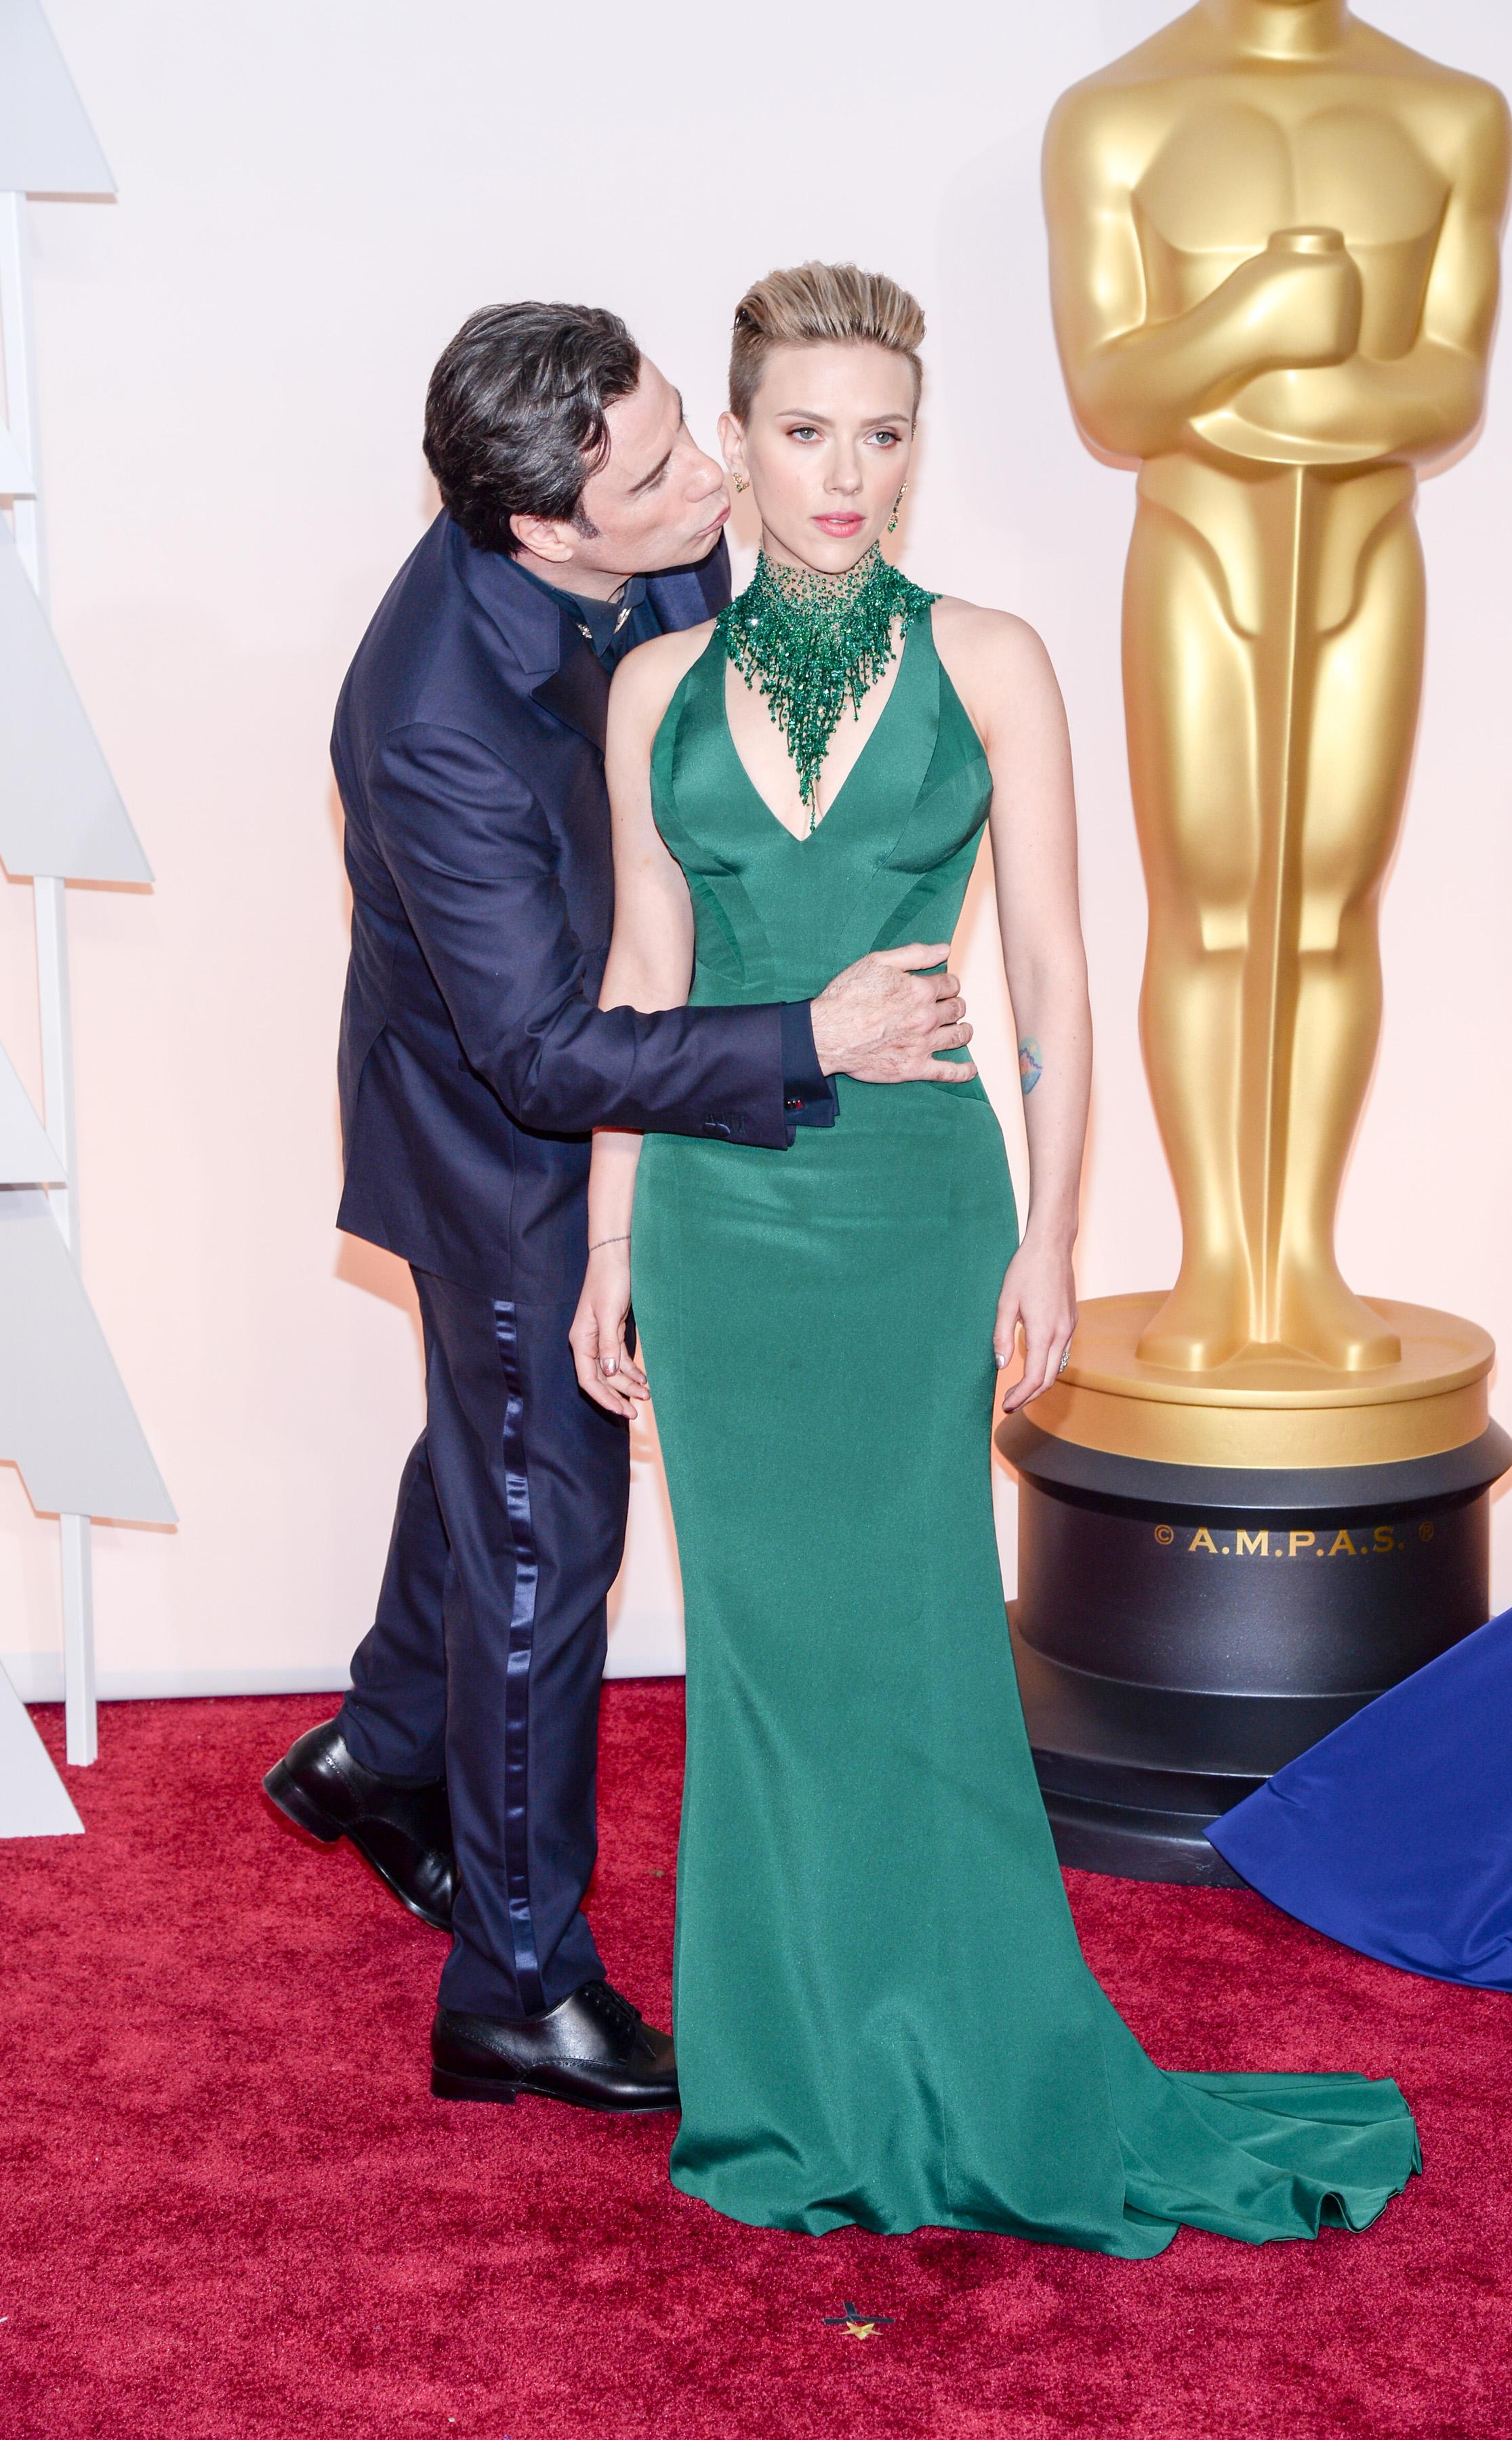 John Travolta (L) and Scarlett Johansson (R) at the 87th Annual Academy Awards in Hollywood, Calif. on Feb. 22, 2015.